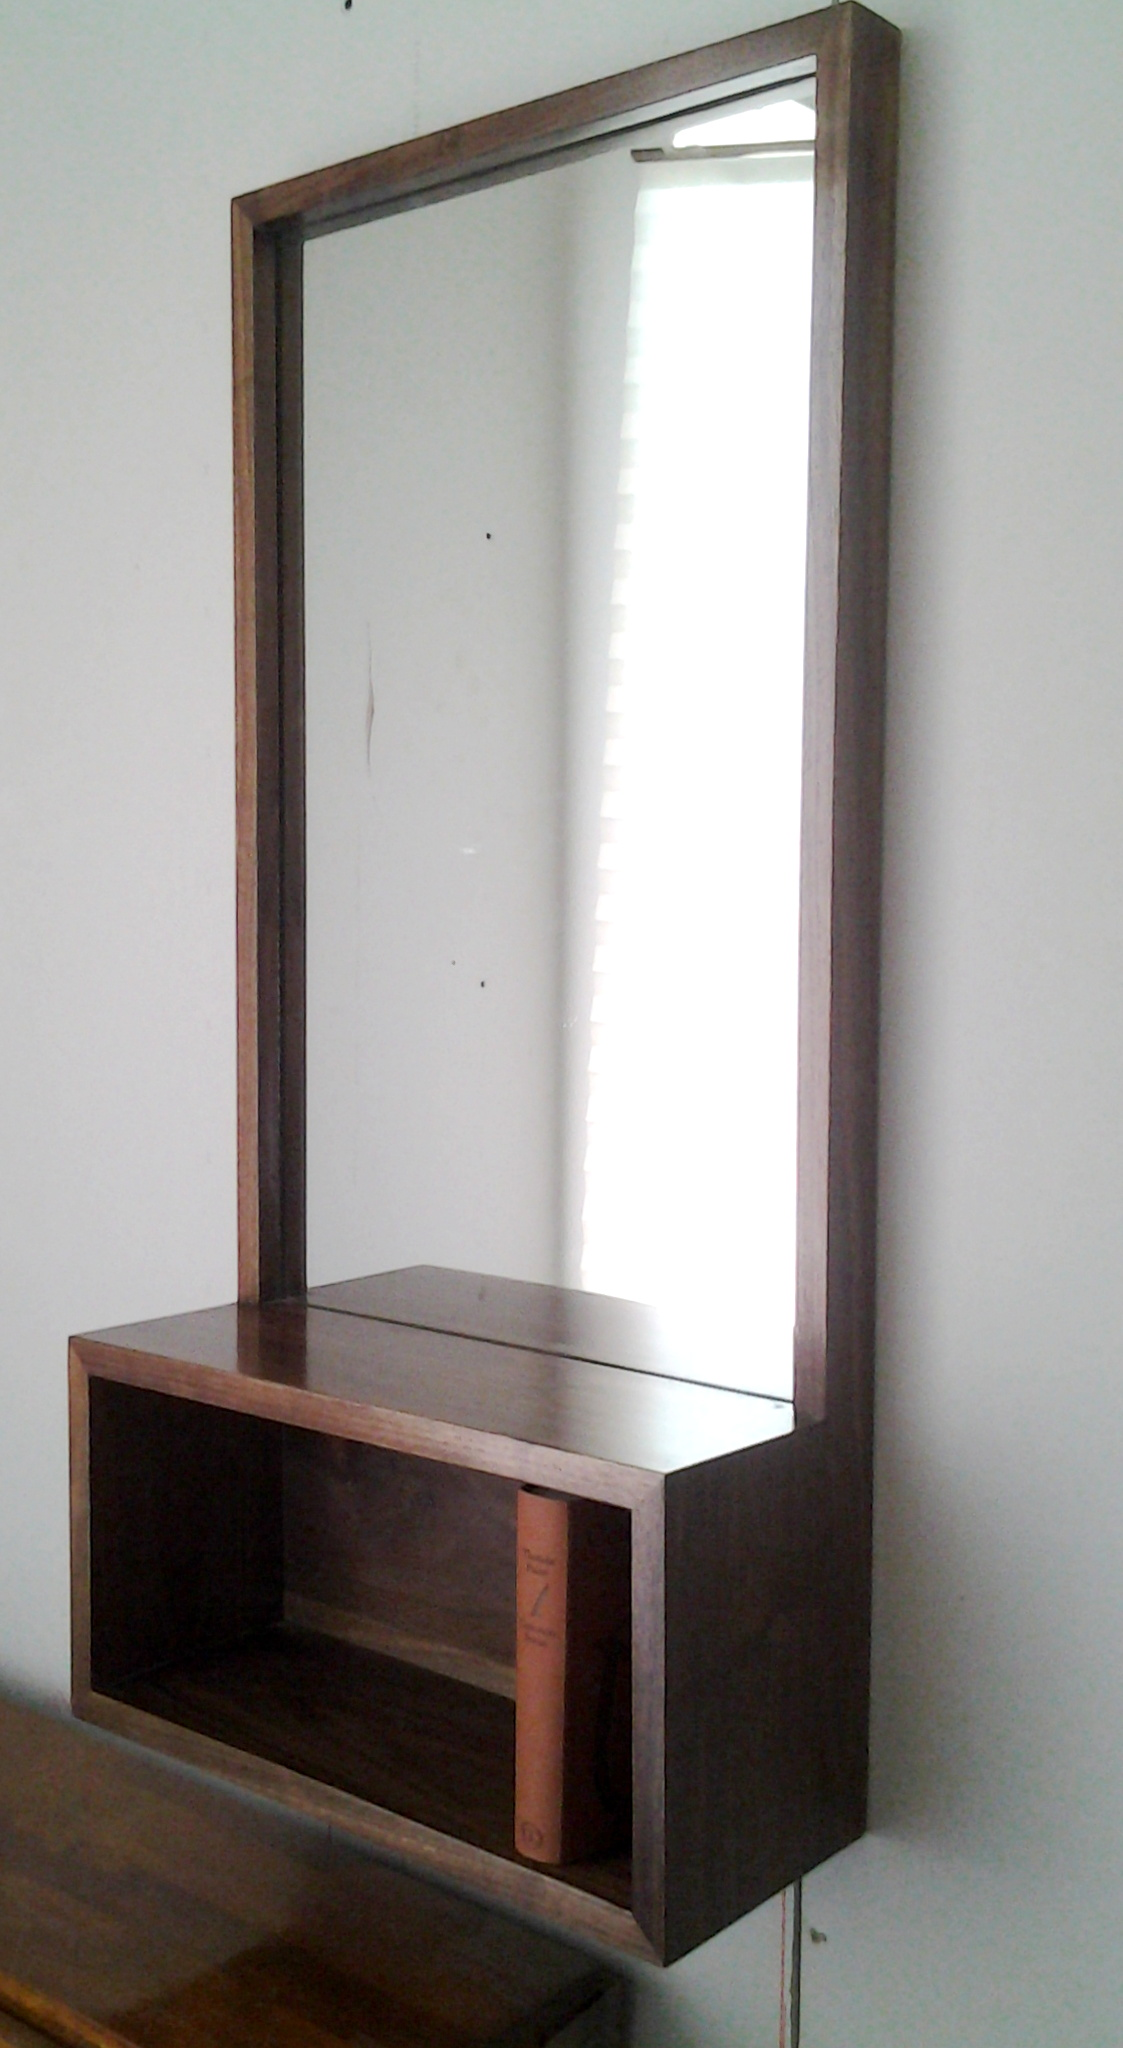 Famous Walnut Entry Hall Mirror with Shelf | HO23